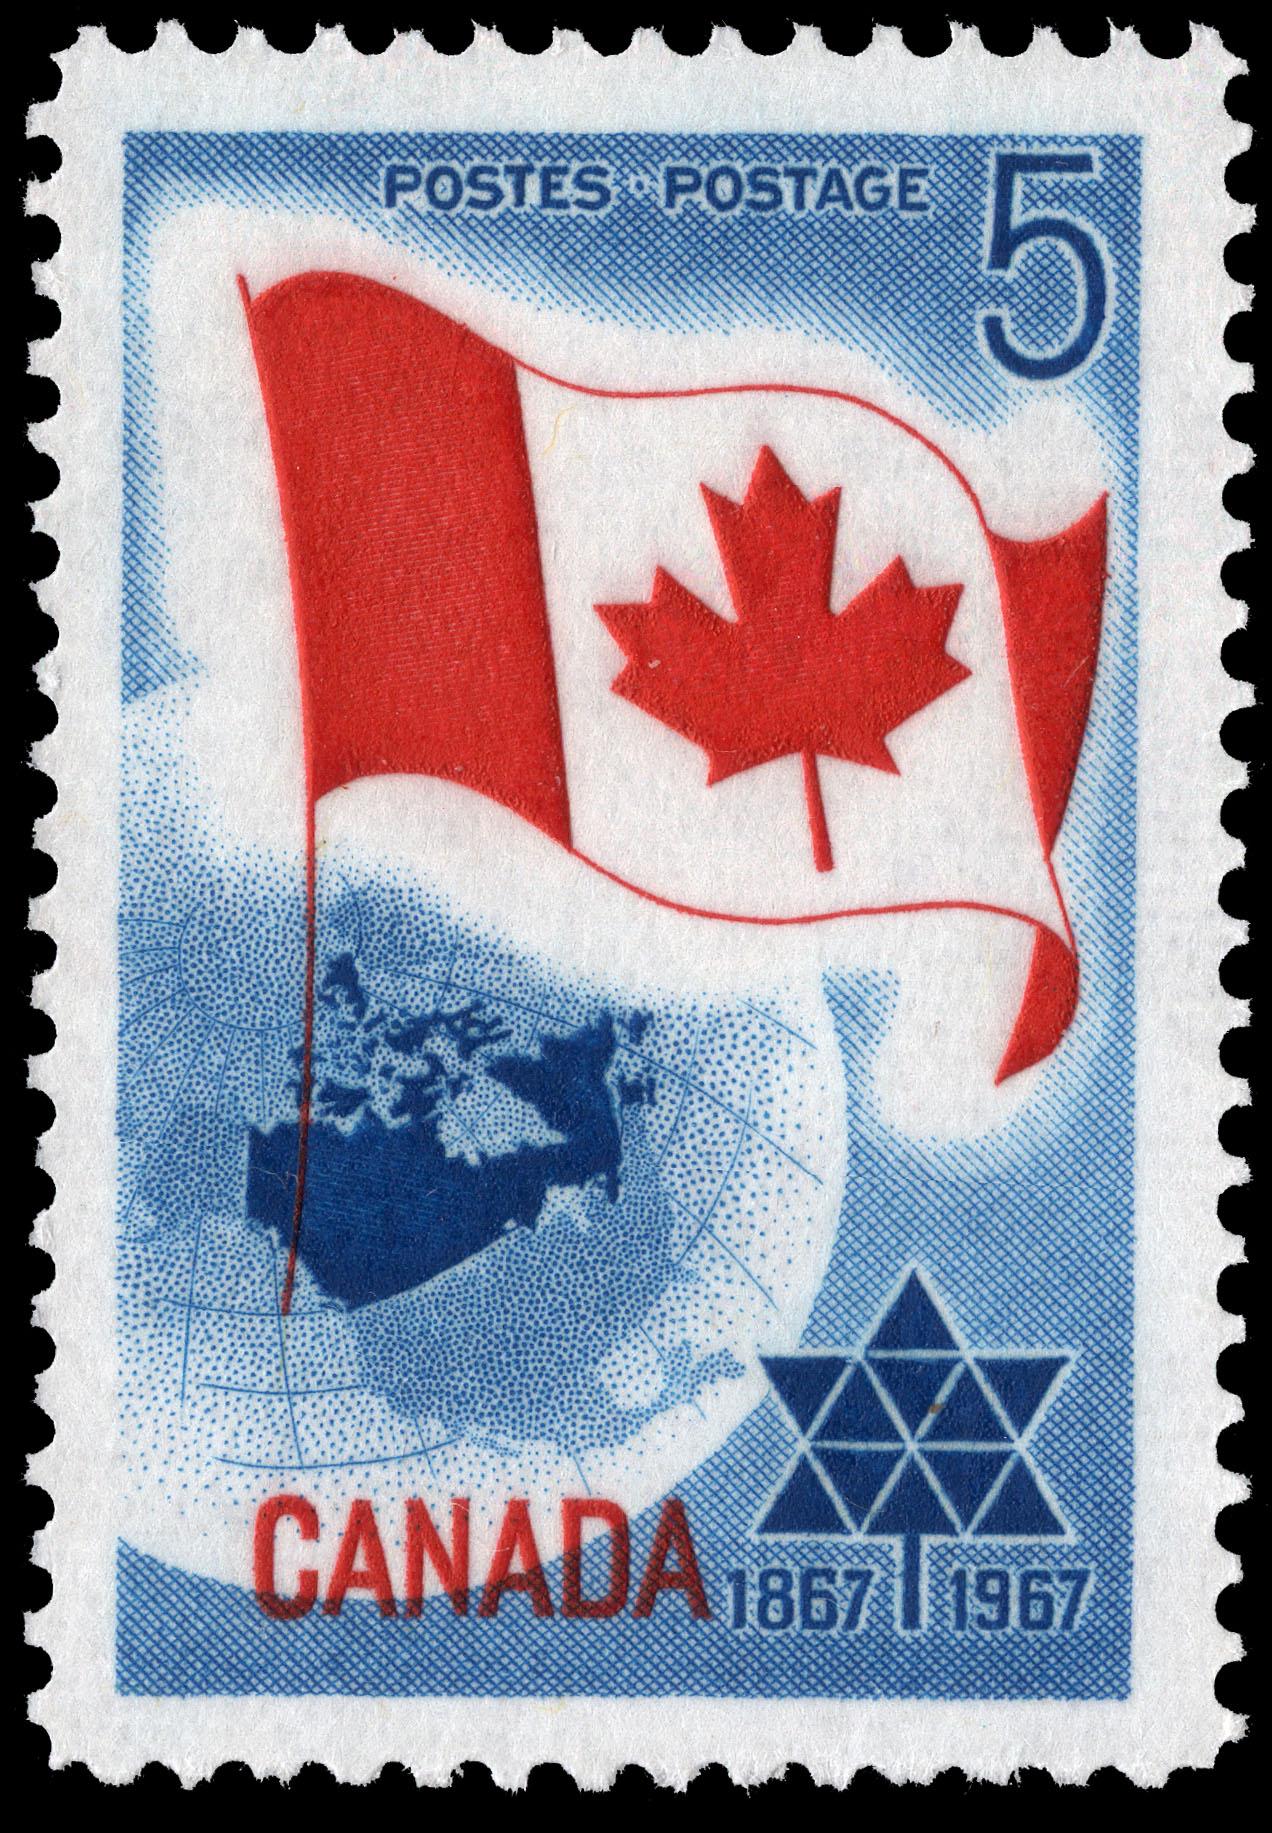 Centennial, 1867-1967 Canada Postage Stamp